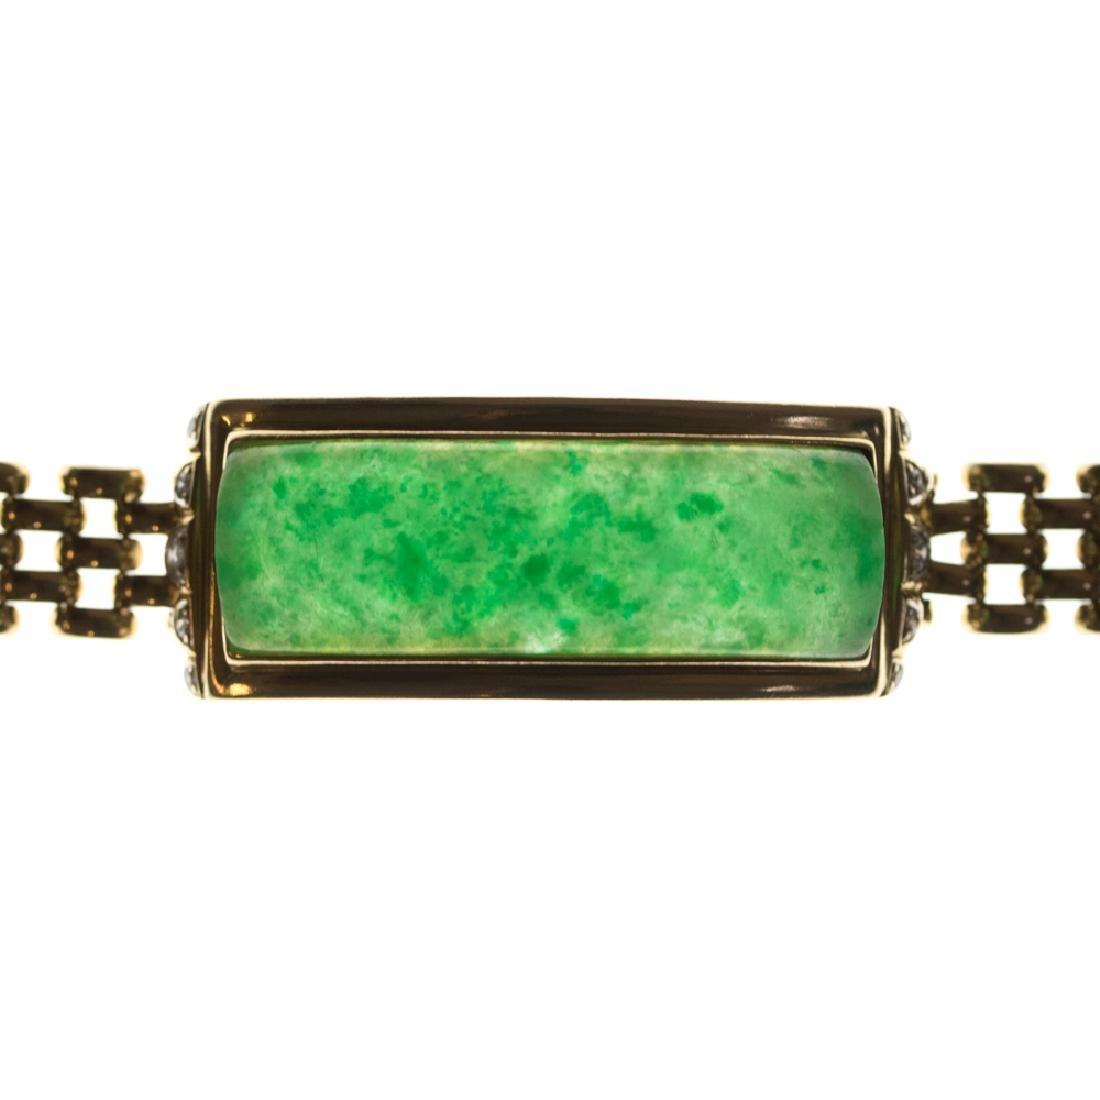 A 14kt. Yellow Gold, Green Jade and Diamond Bracelet, - 5